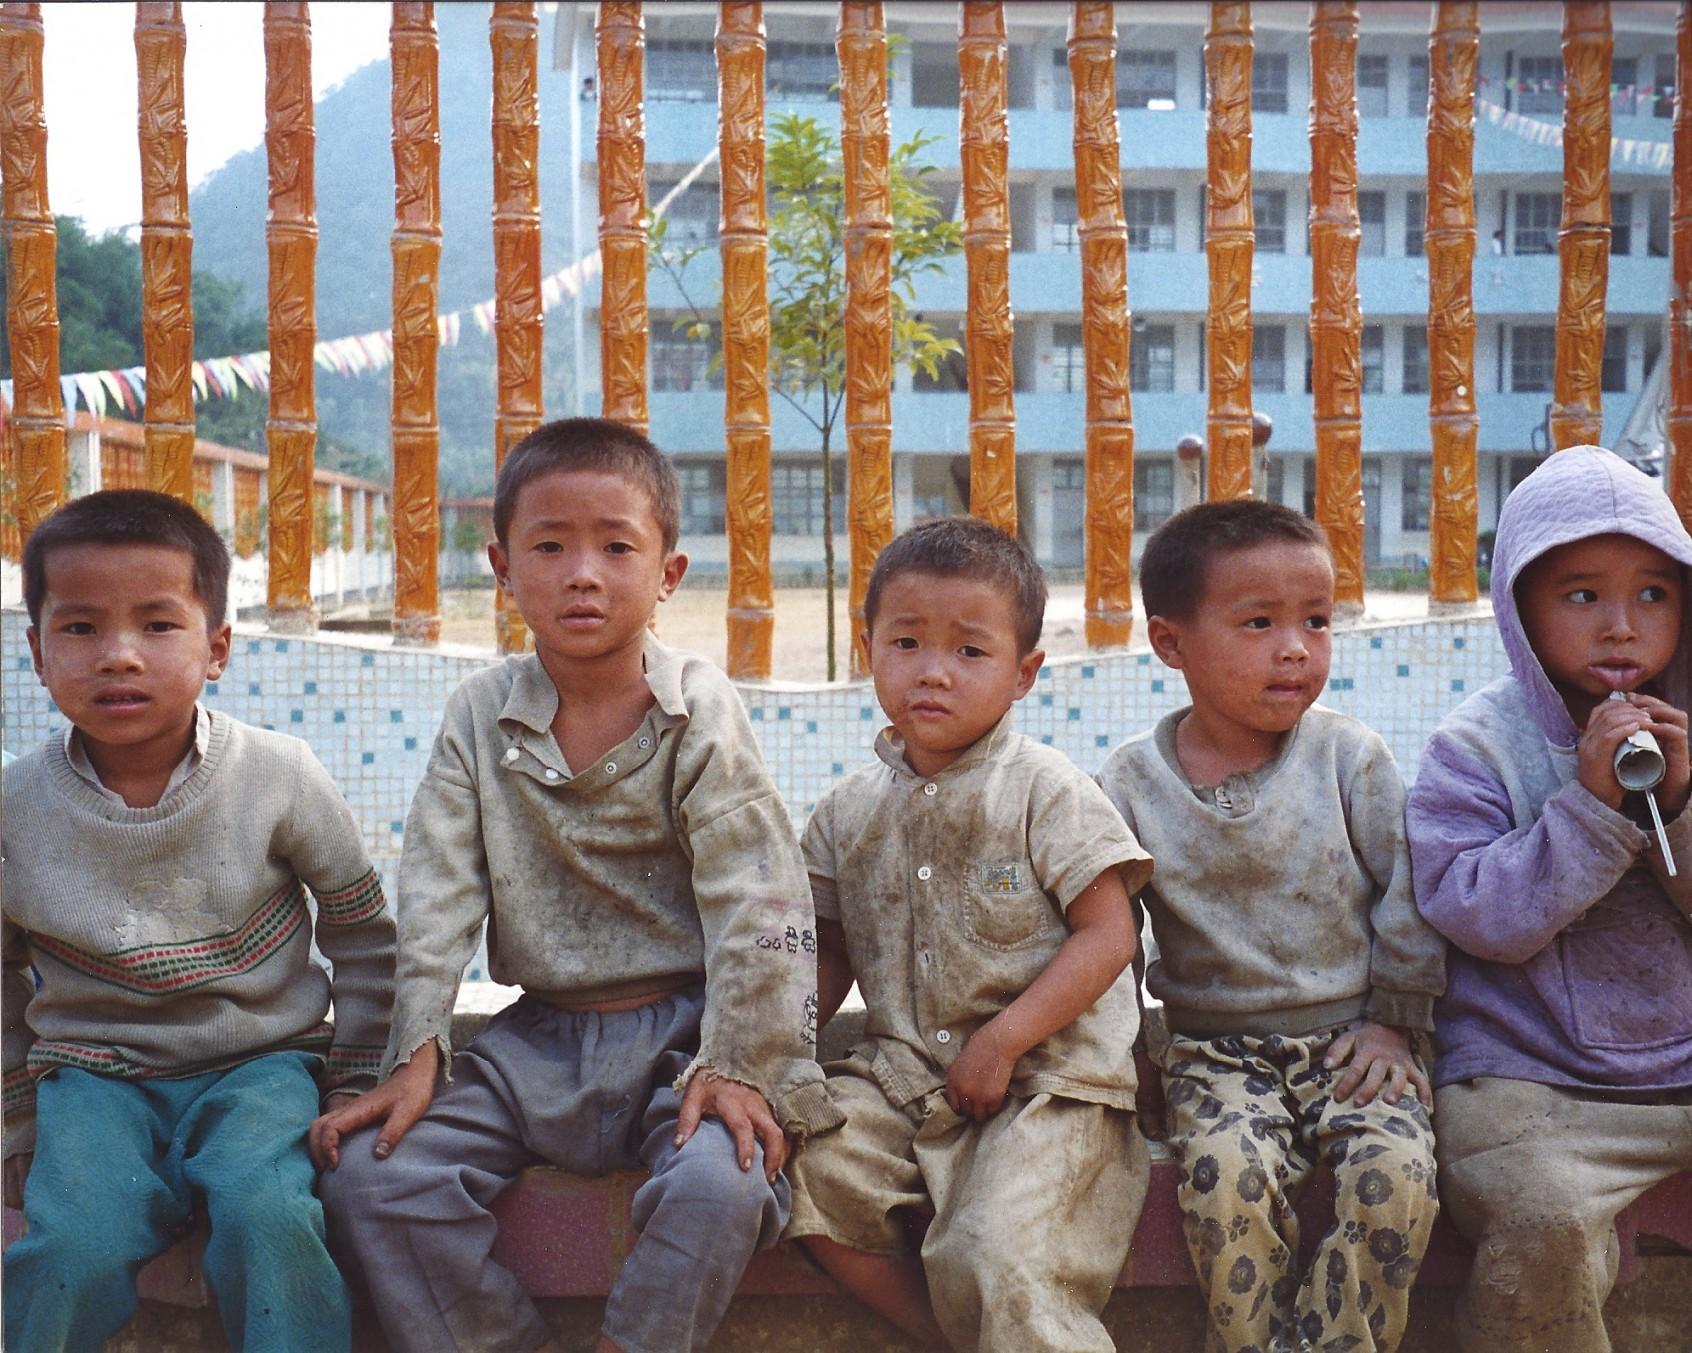 Children who need help